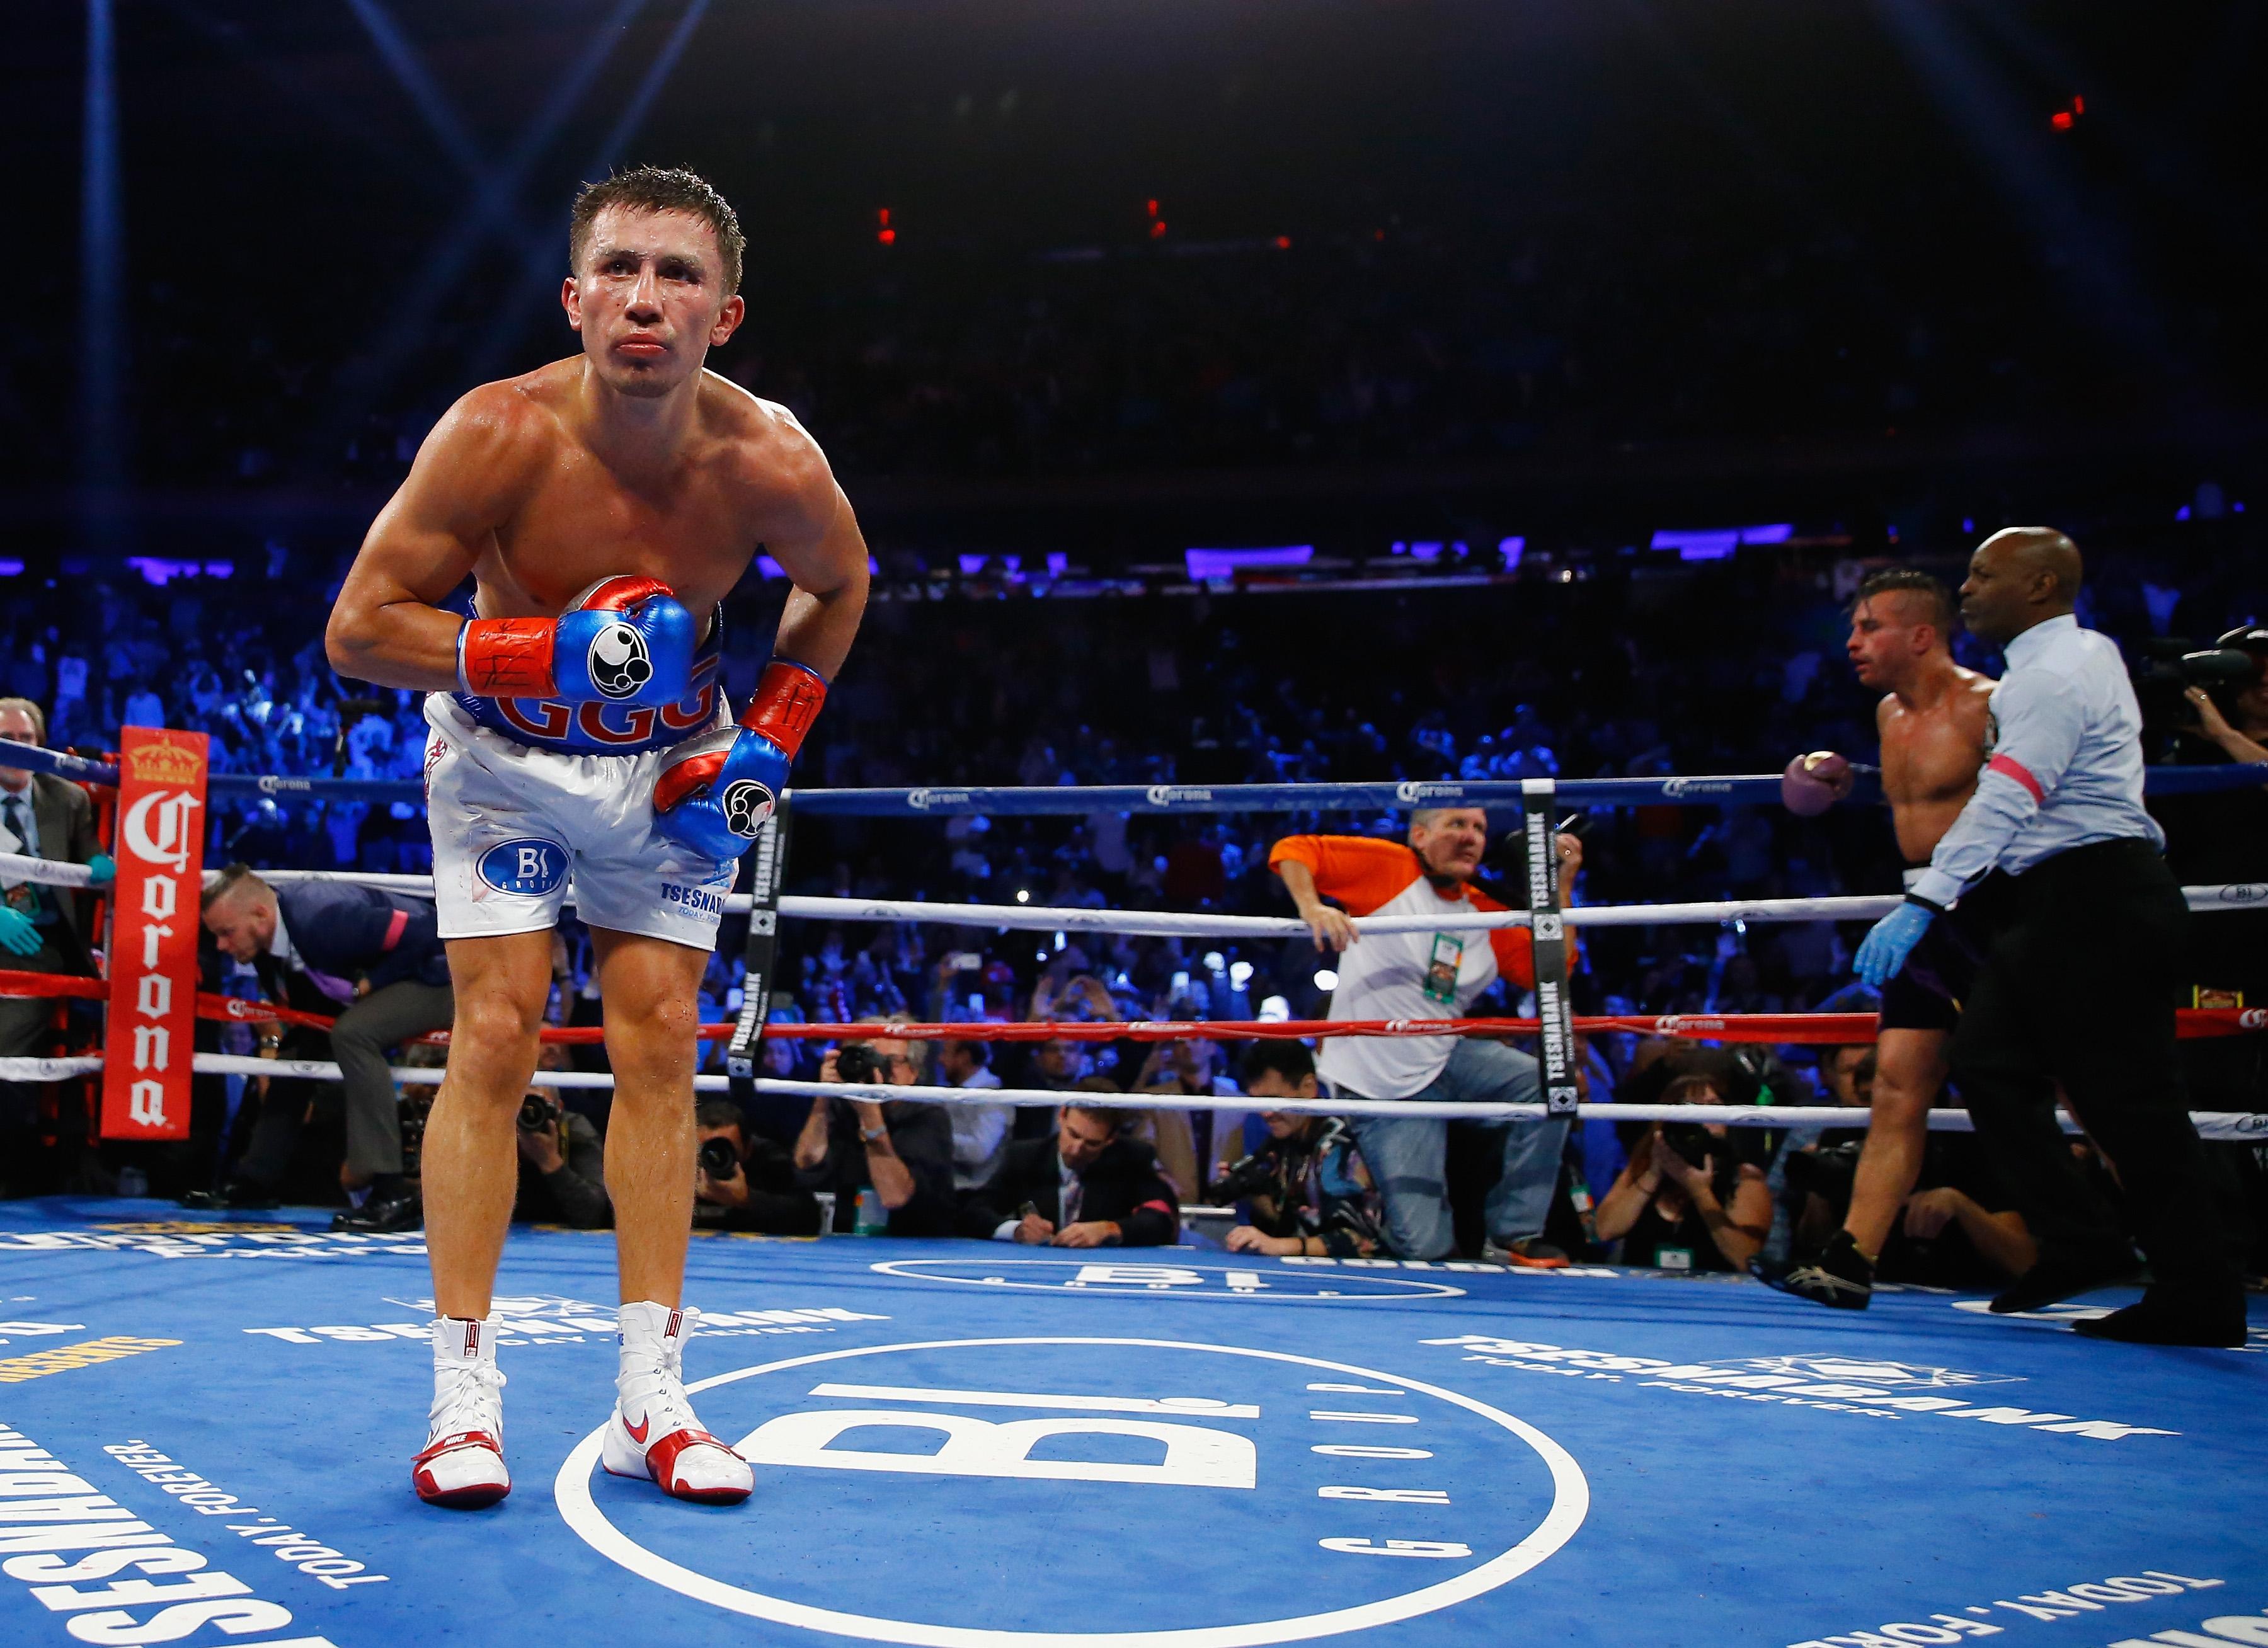 Gennady Golovkin pelea, cuando es la pelea de Gennady Golovkin